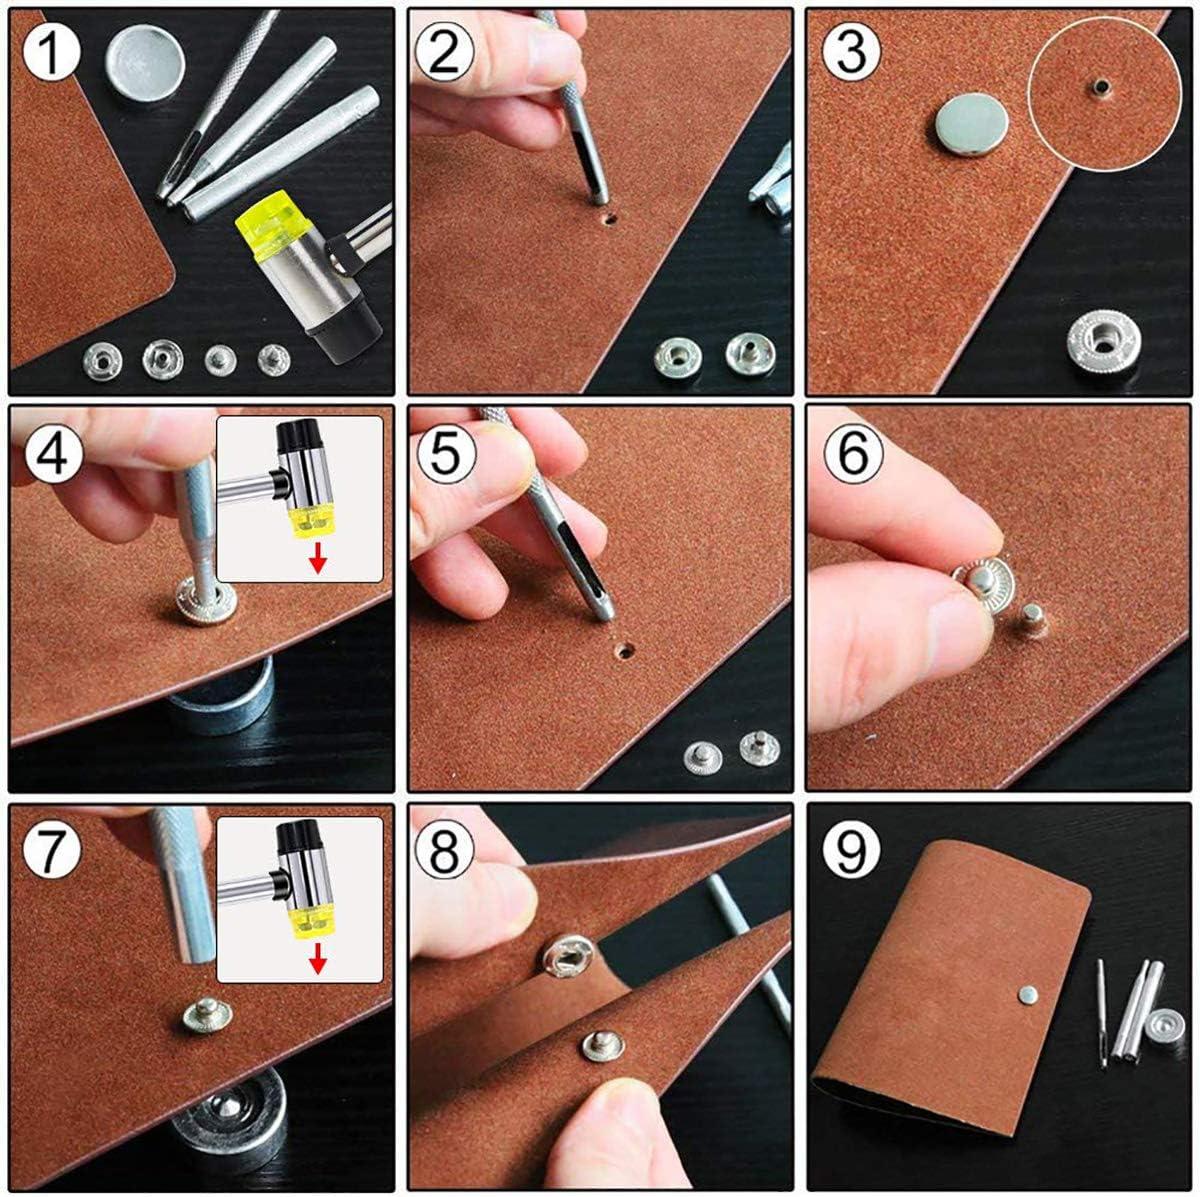 100 set di bottoni a pressione carta per pelle senza cuciture Wuudi plastica 240 set di borchie double face Kit di pinze per fori in pelle